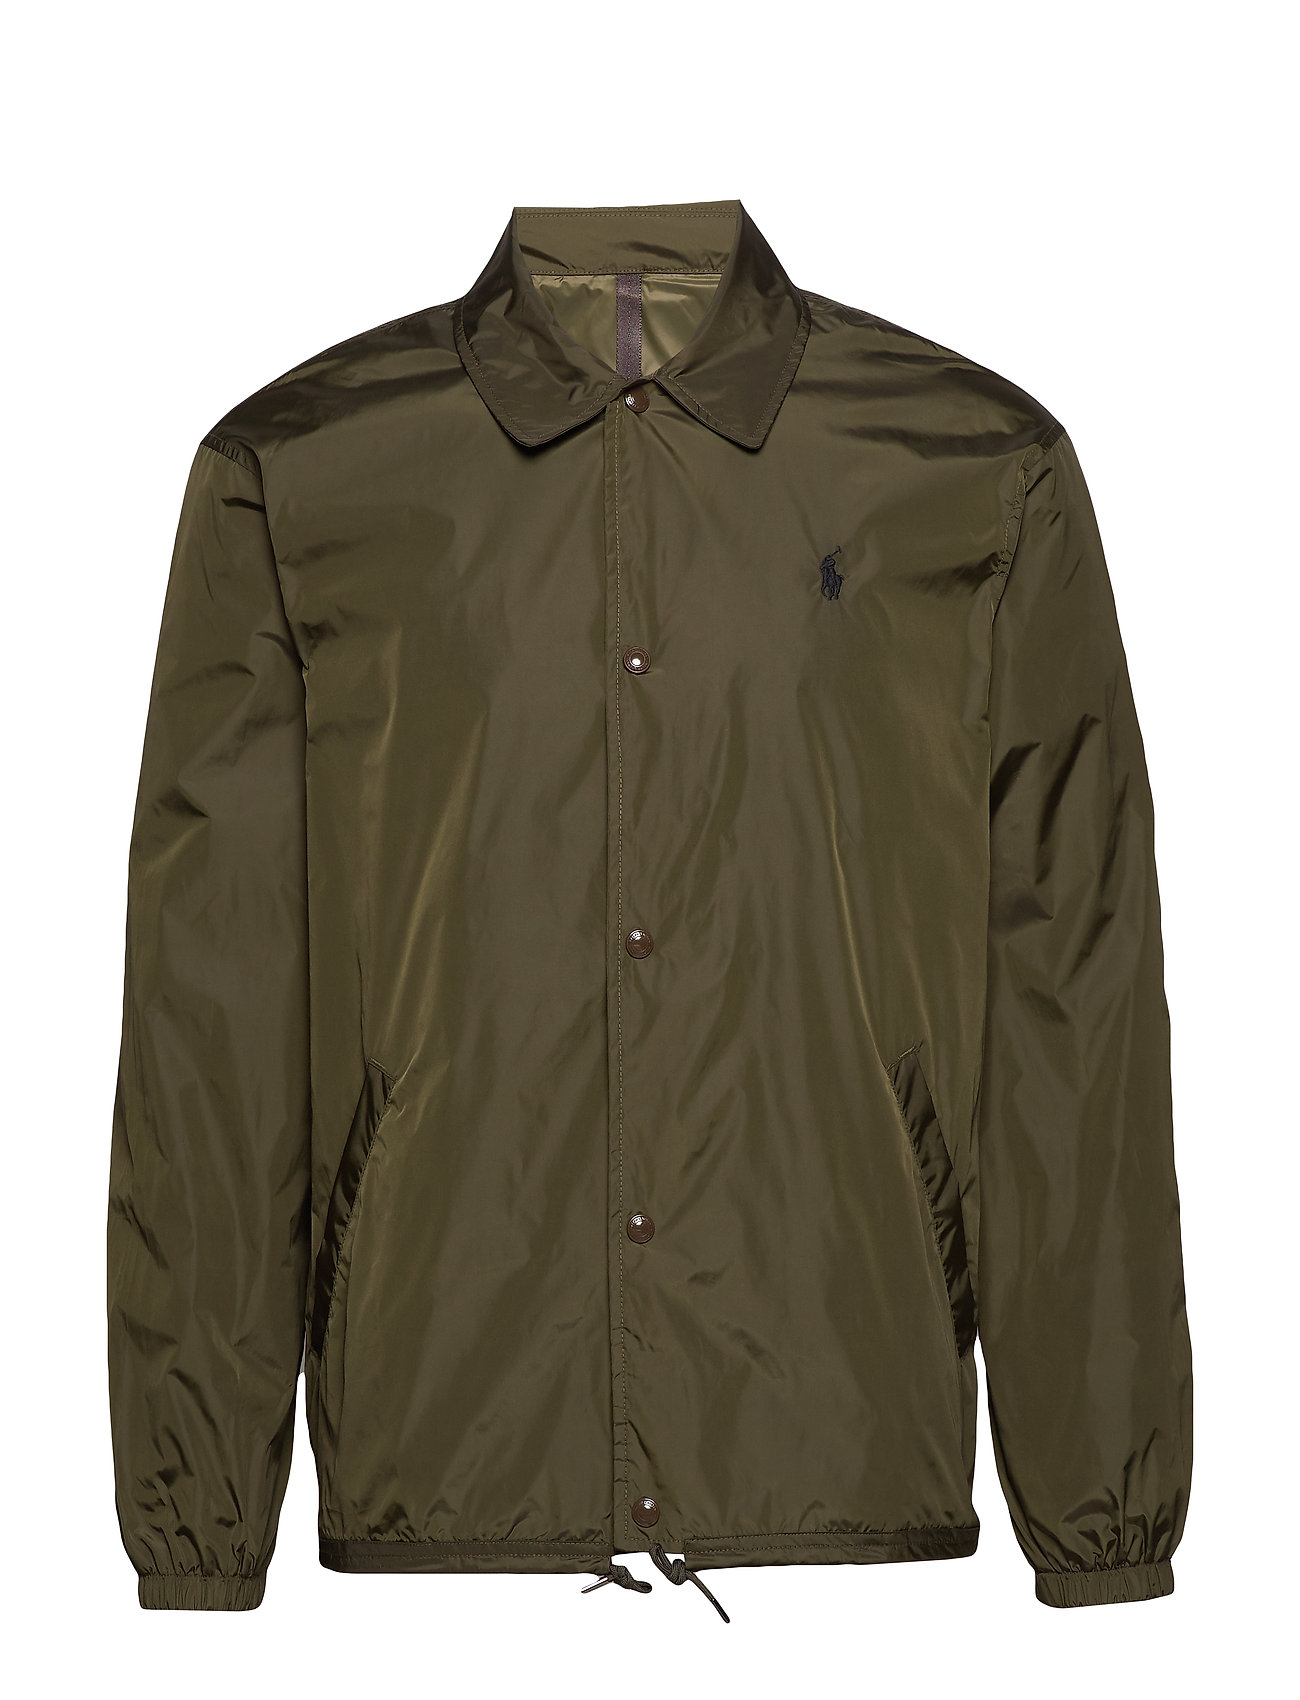 Polo Ralph Lauren Coach Jacket - COMPANY OLIVE